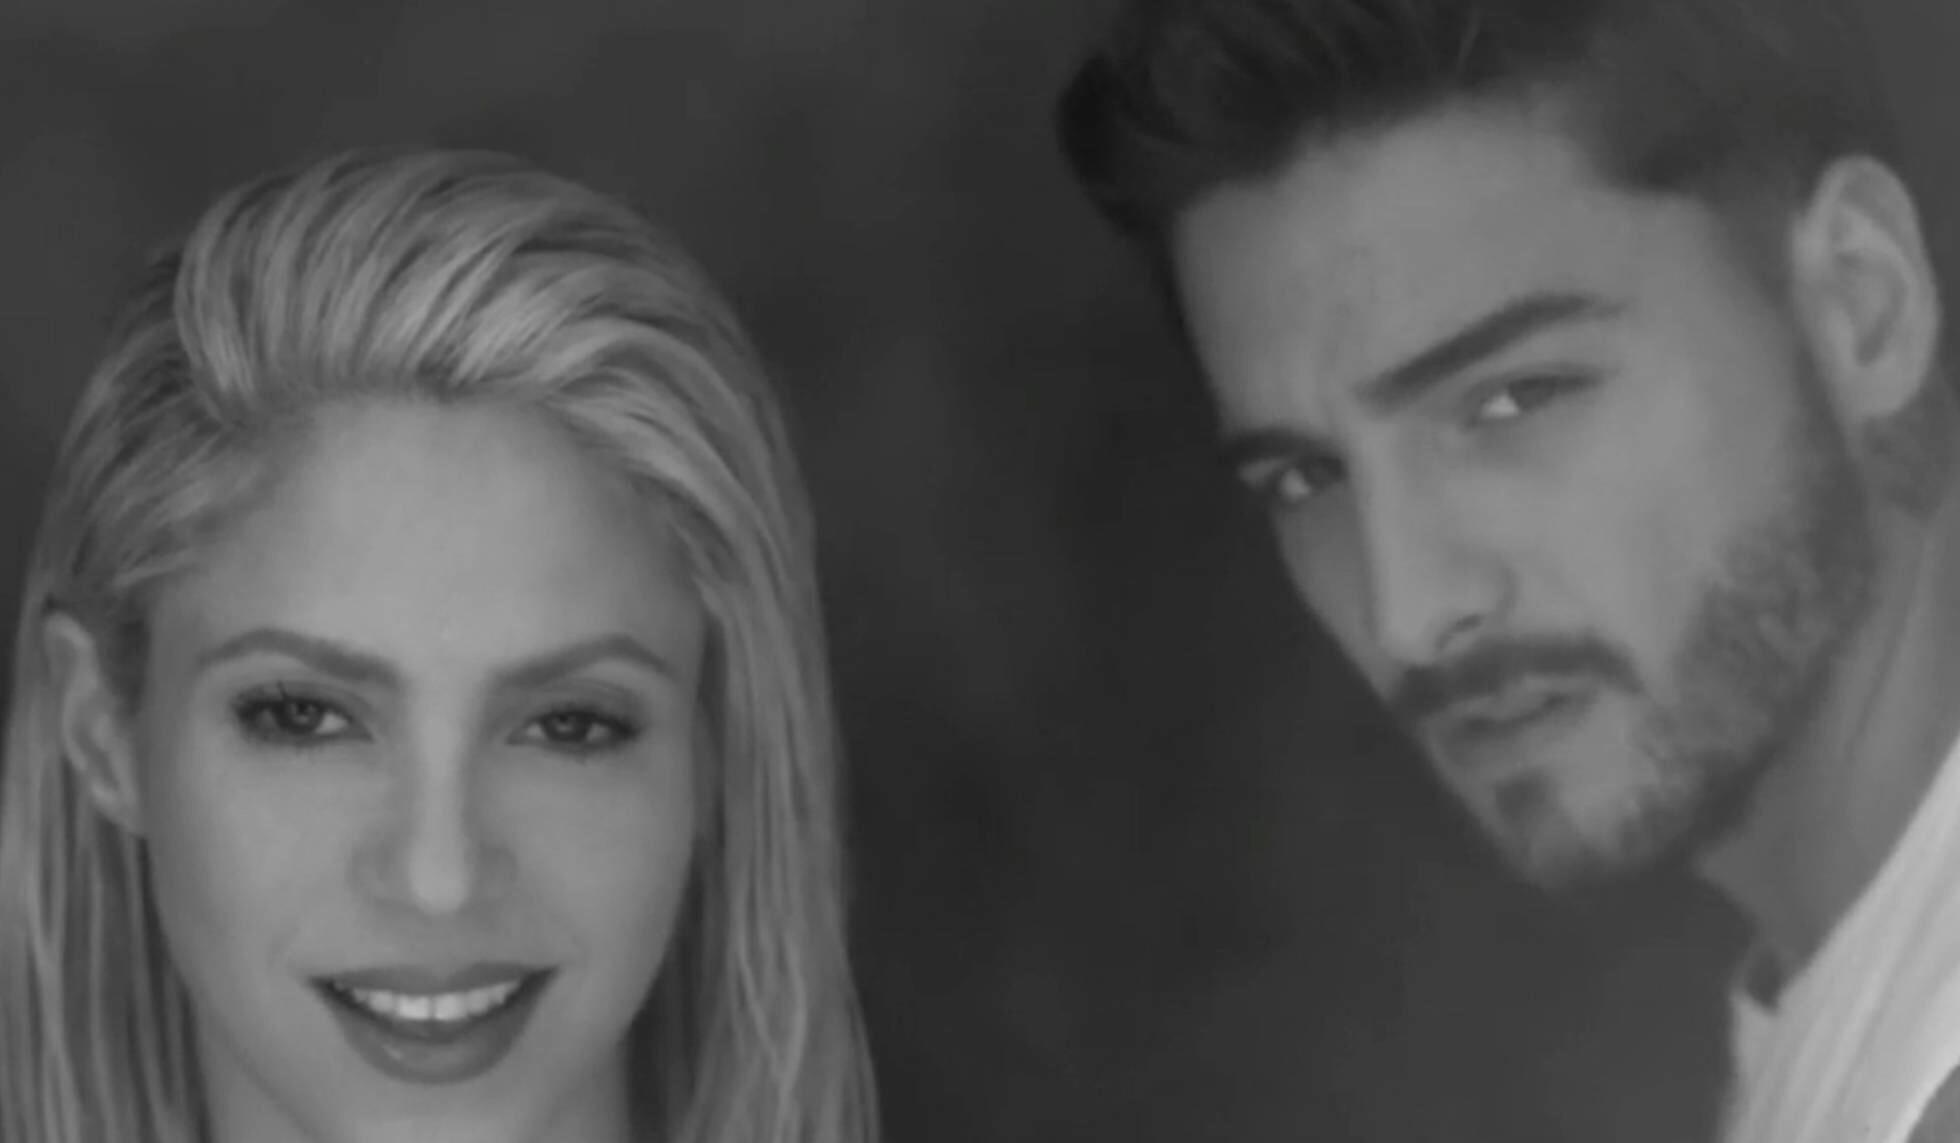 Shakira y Maluma lanzan videos juntos